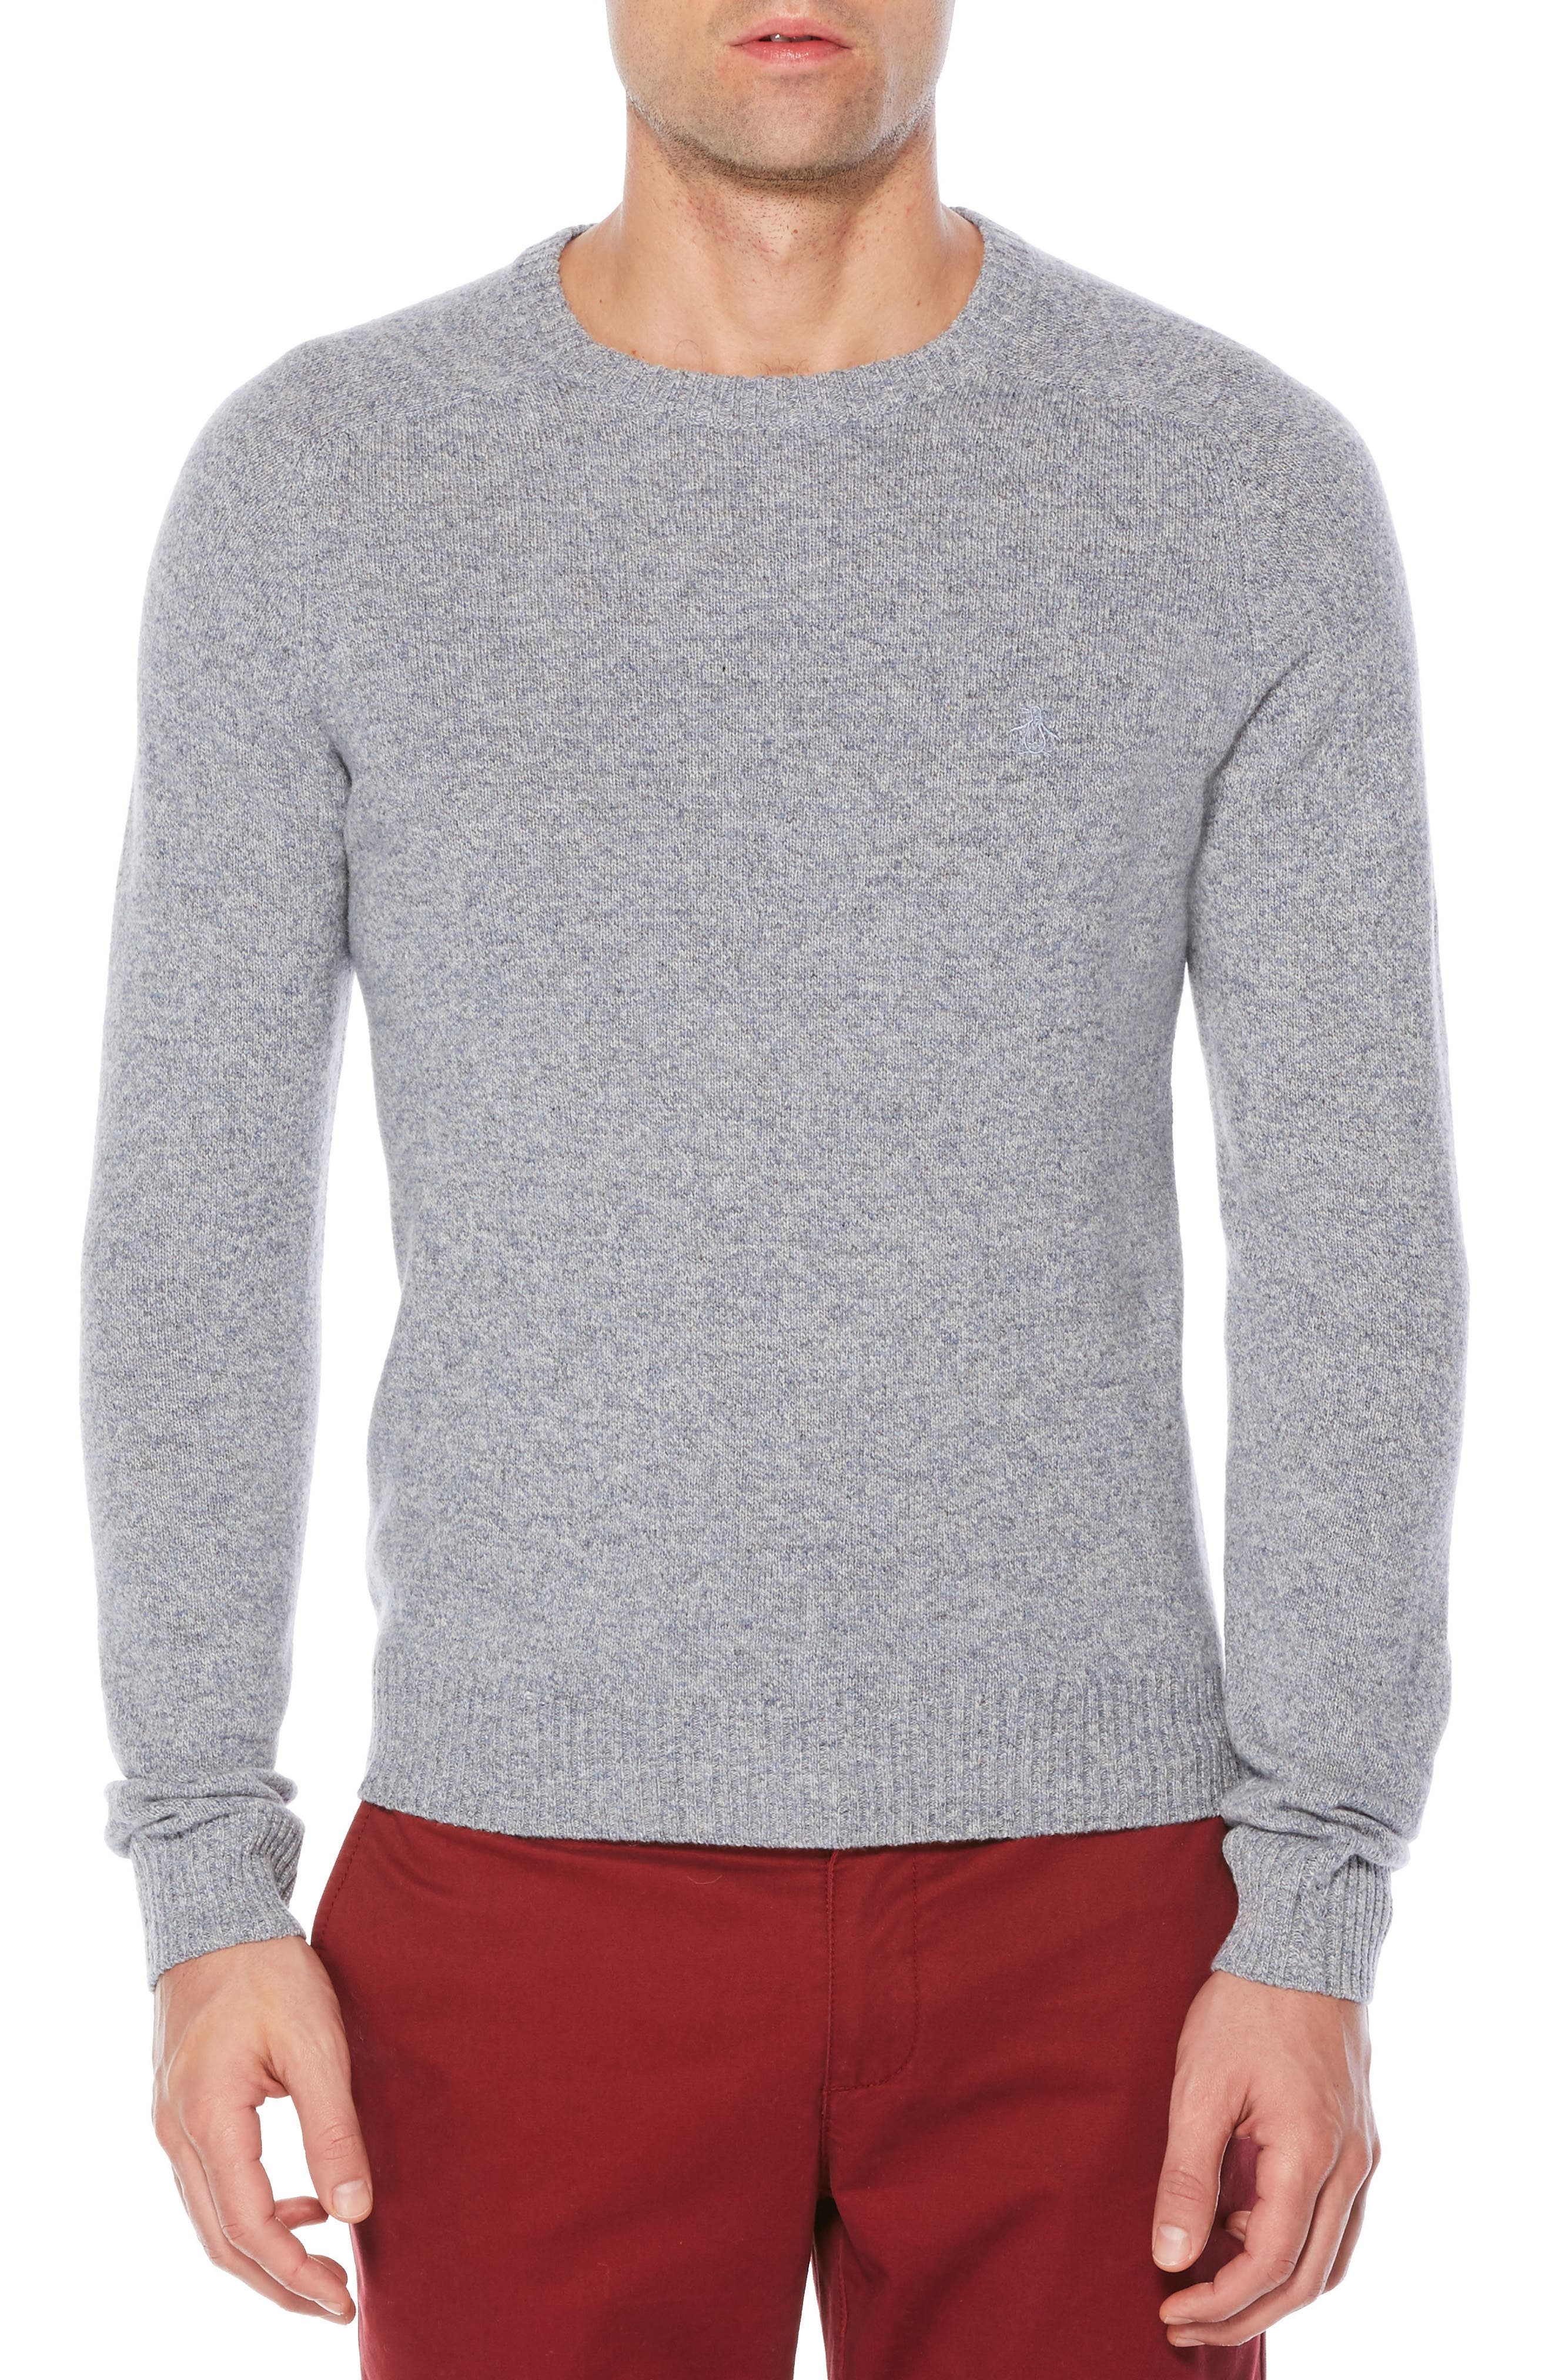 P55 Lambswool Sweater,                             Main thumbnail 3, color,